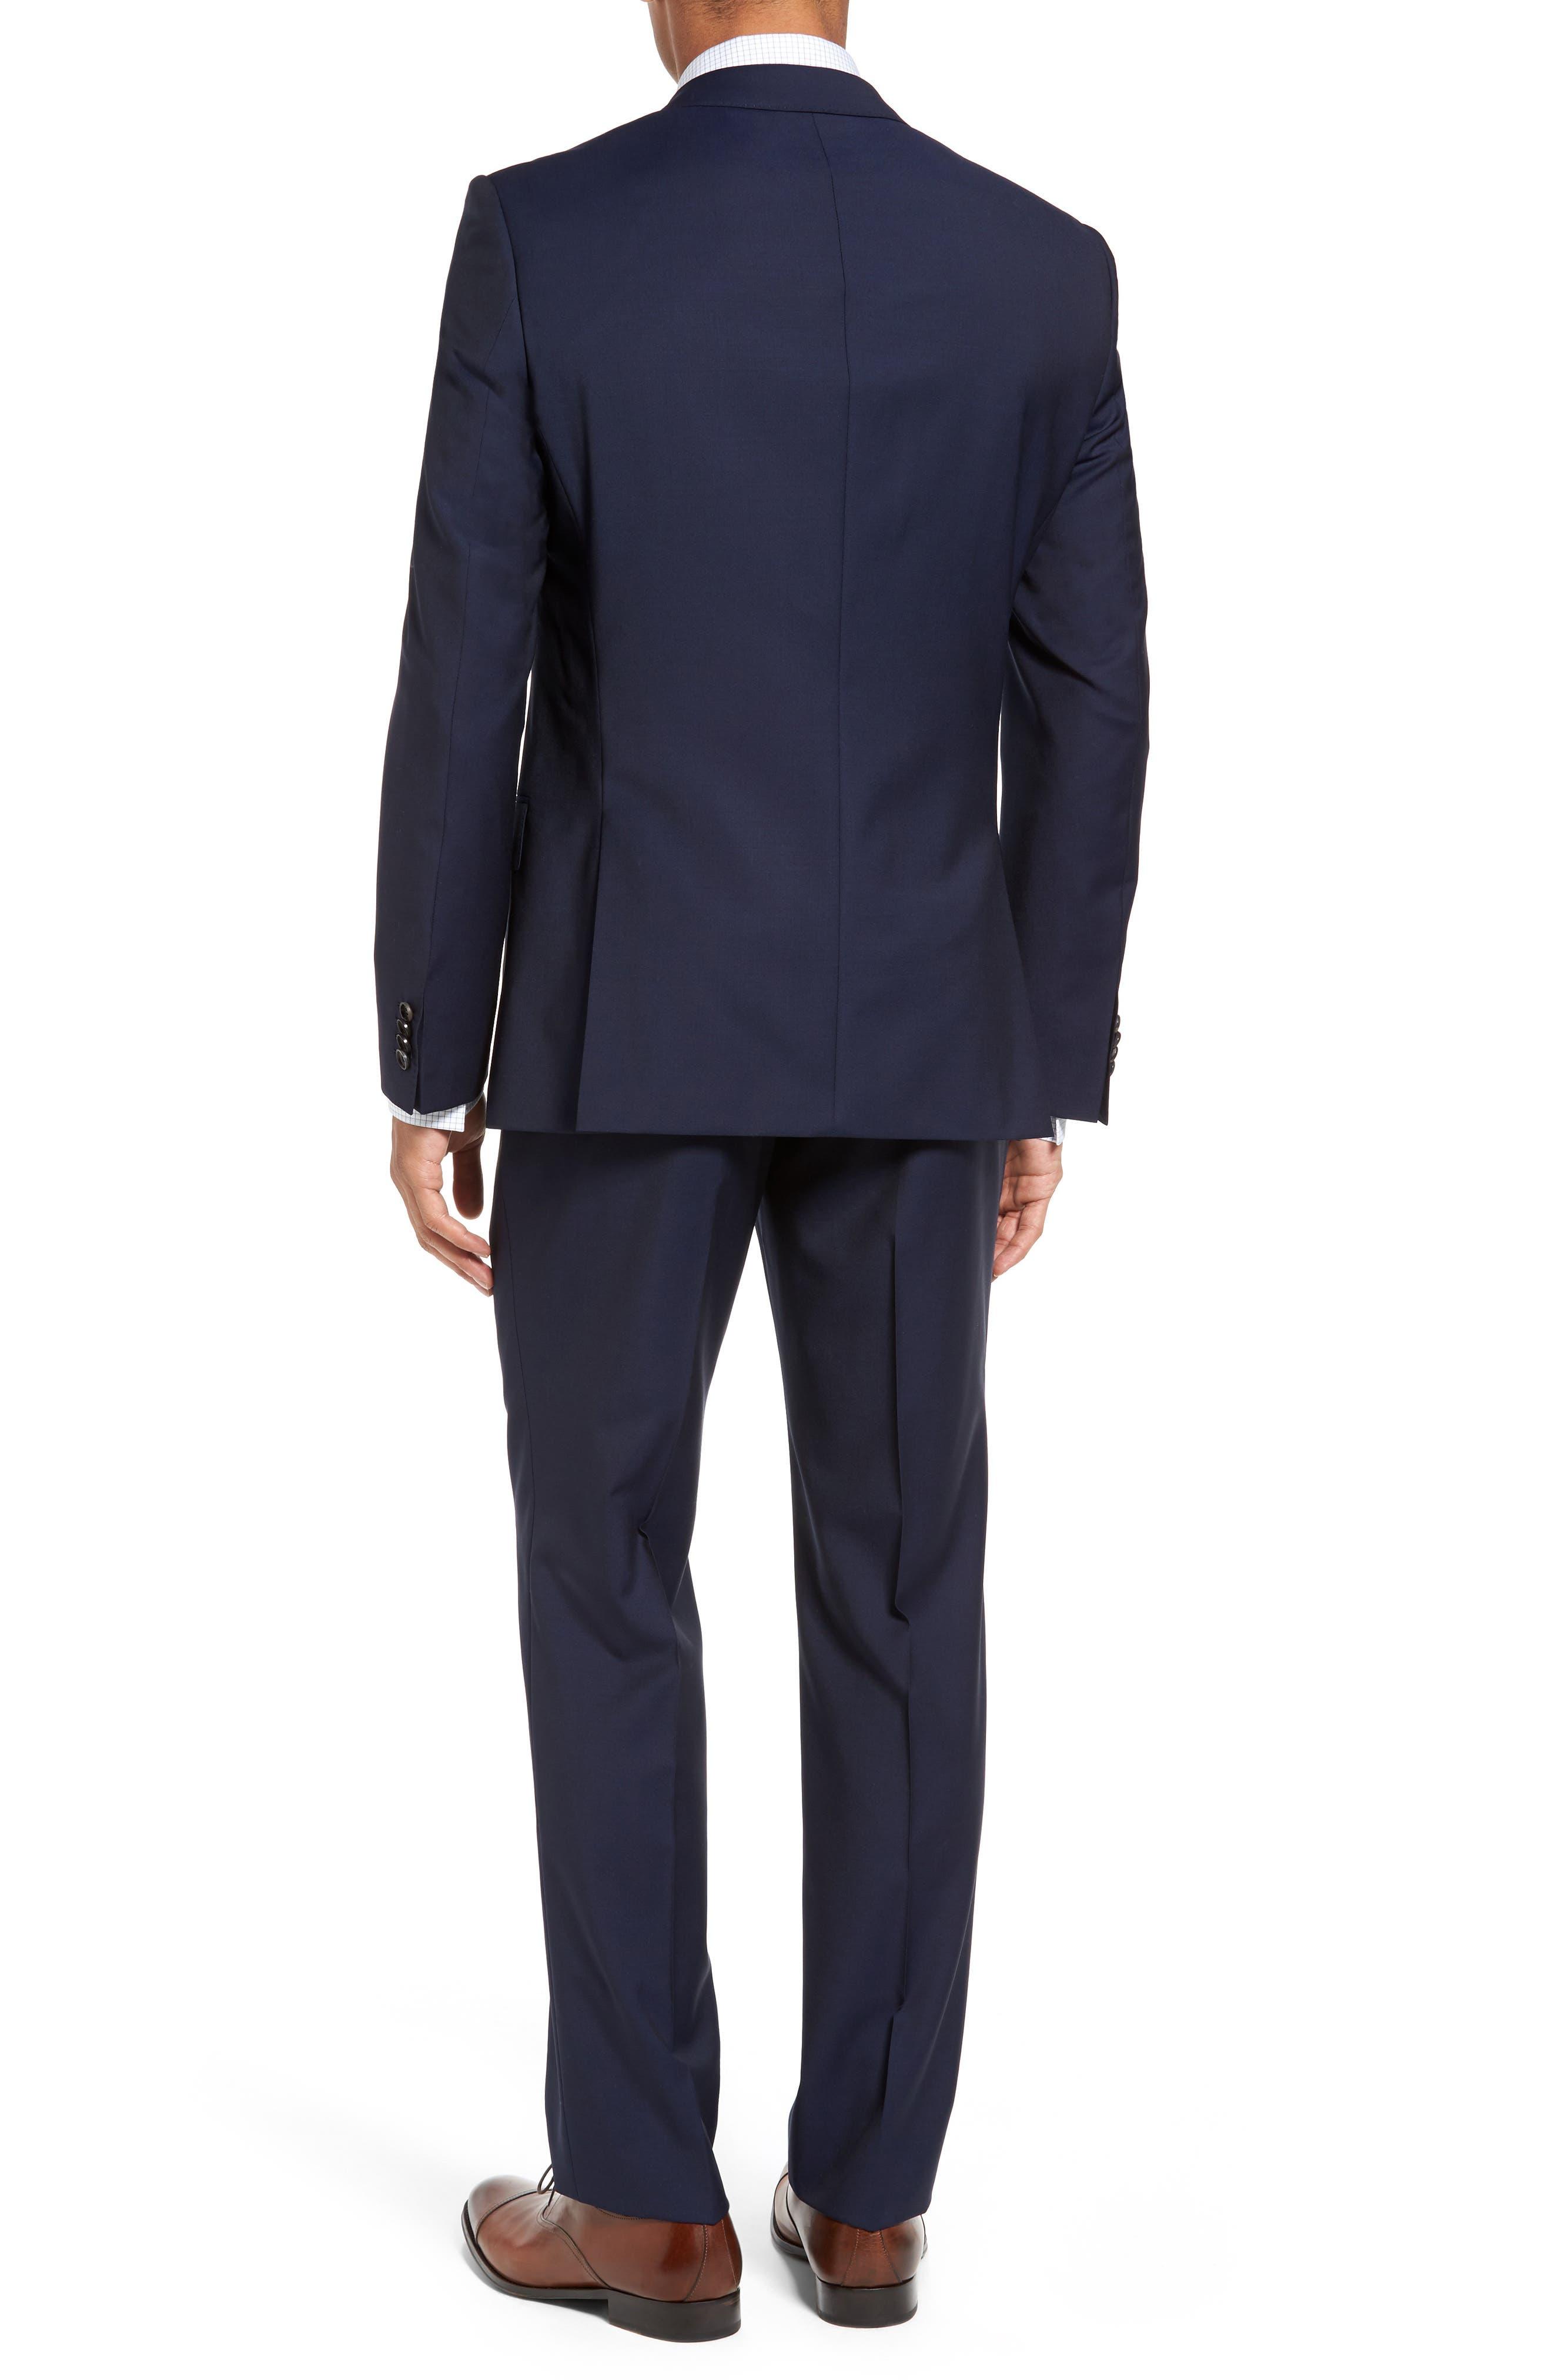 BOSS, Huge/Genius Trim Fit Navy Wool Suit, Alternate thumbnail 2, color, 410